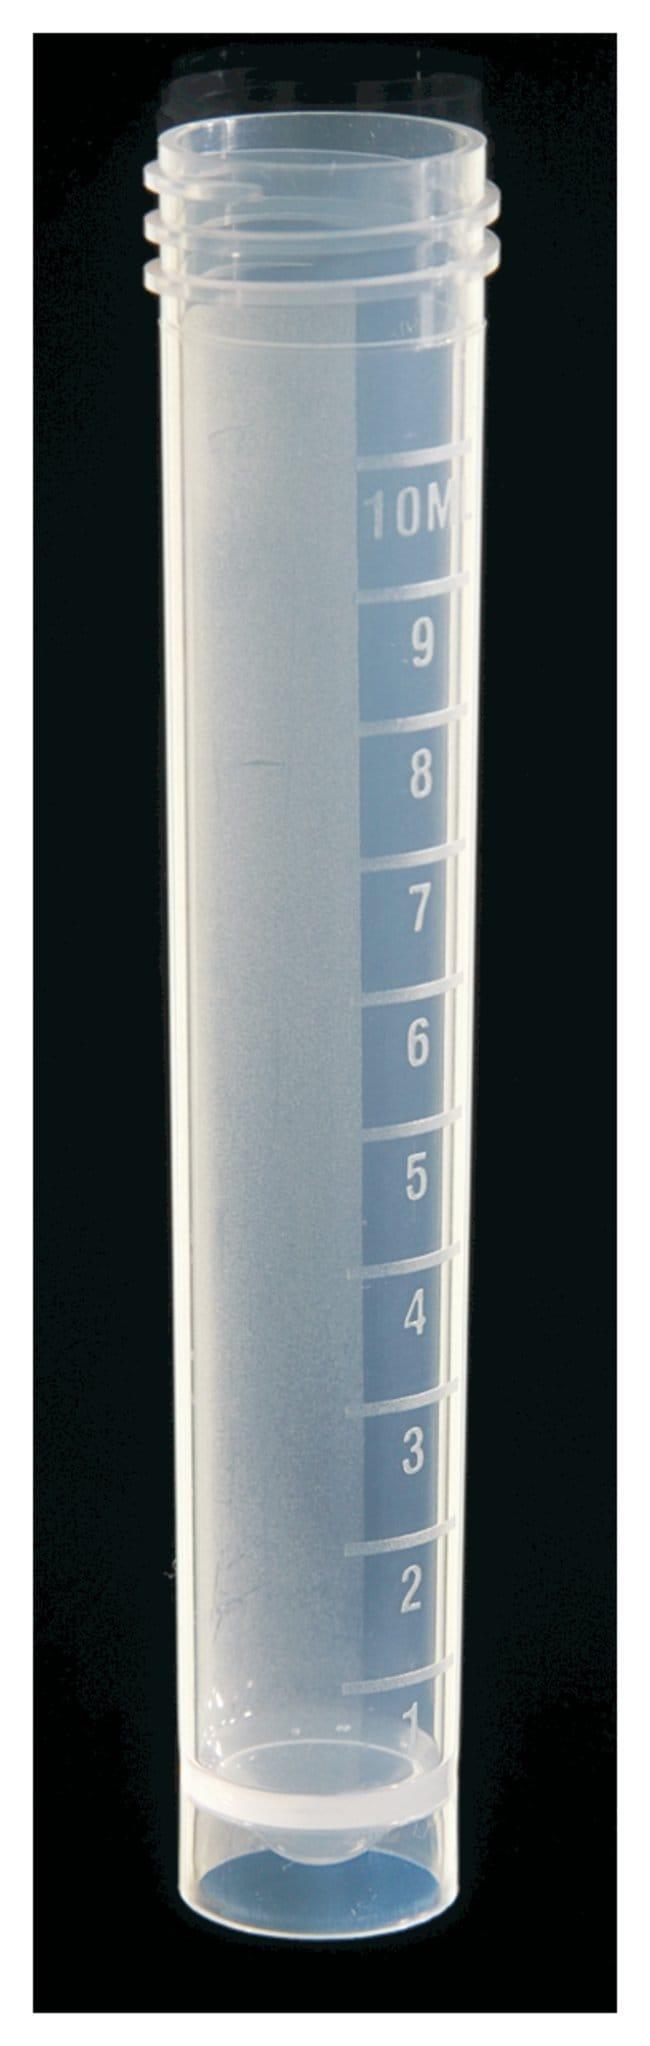 Axygen™Screw Cap Transport Tubes